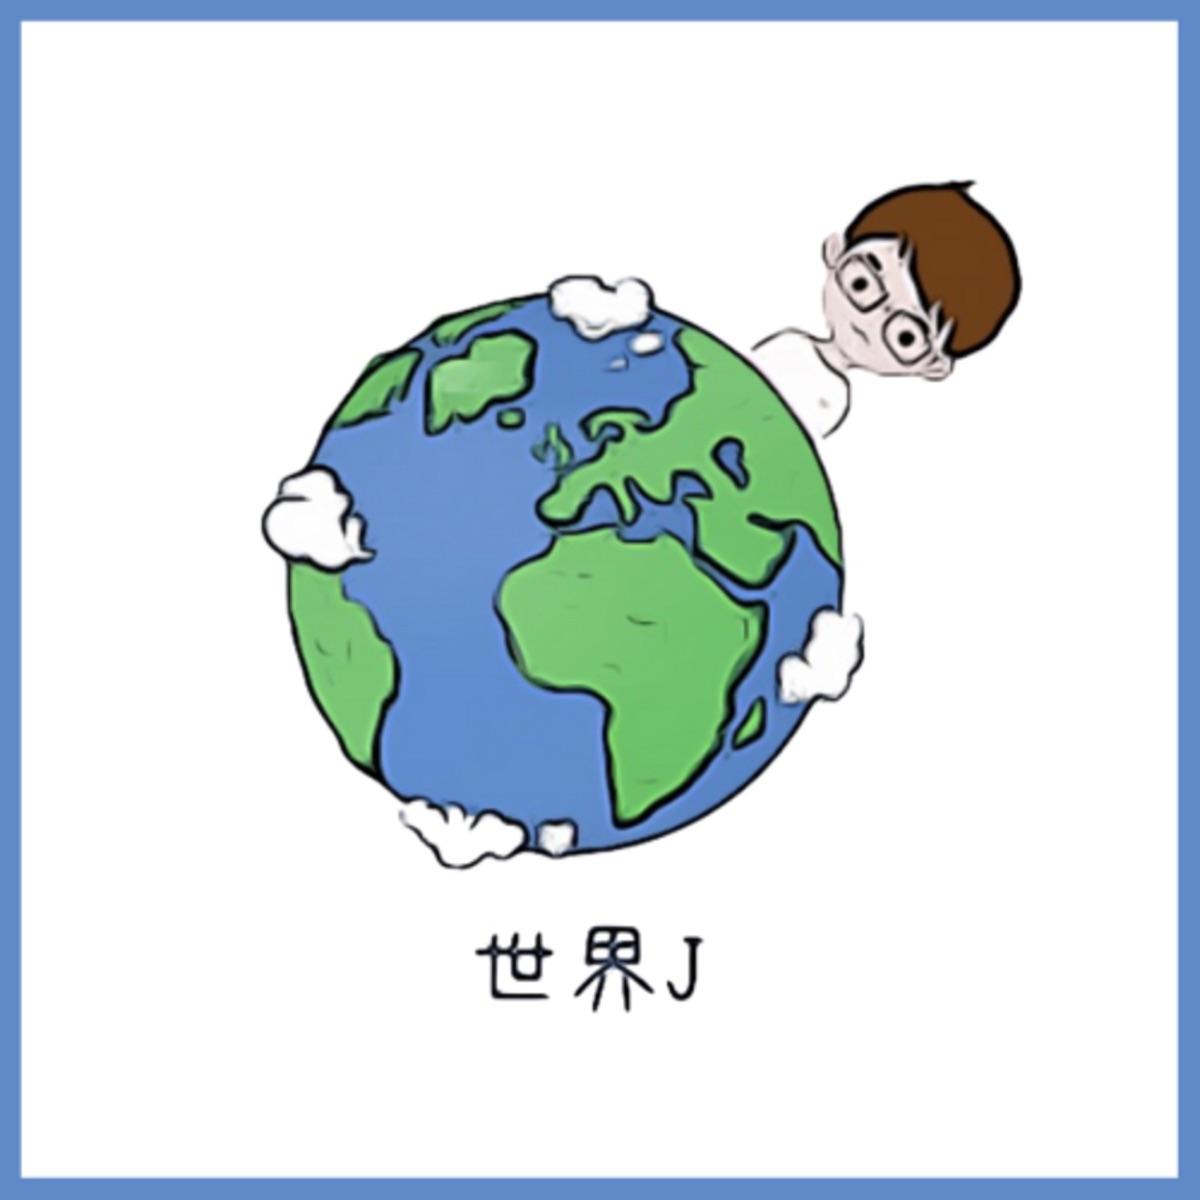 世界J 🌏